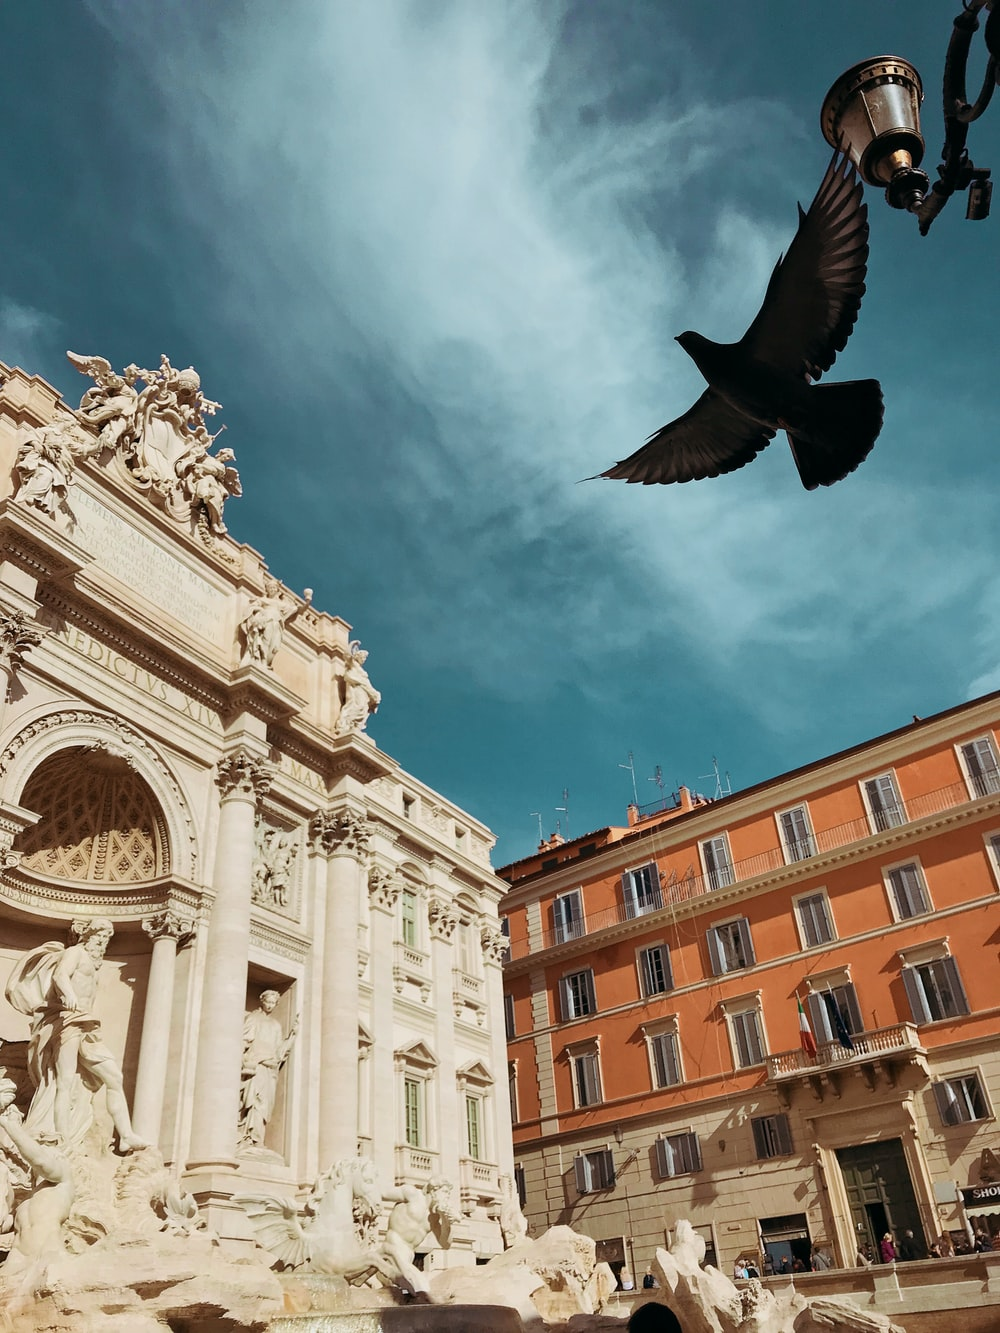 soaring bird near building